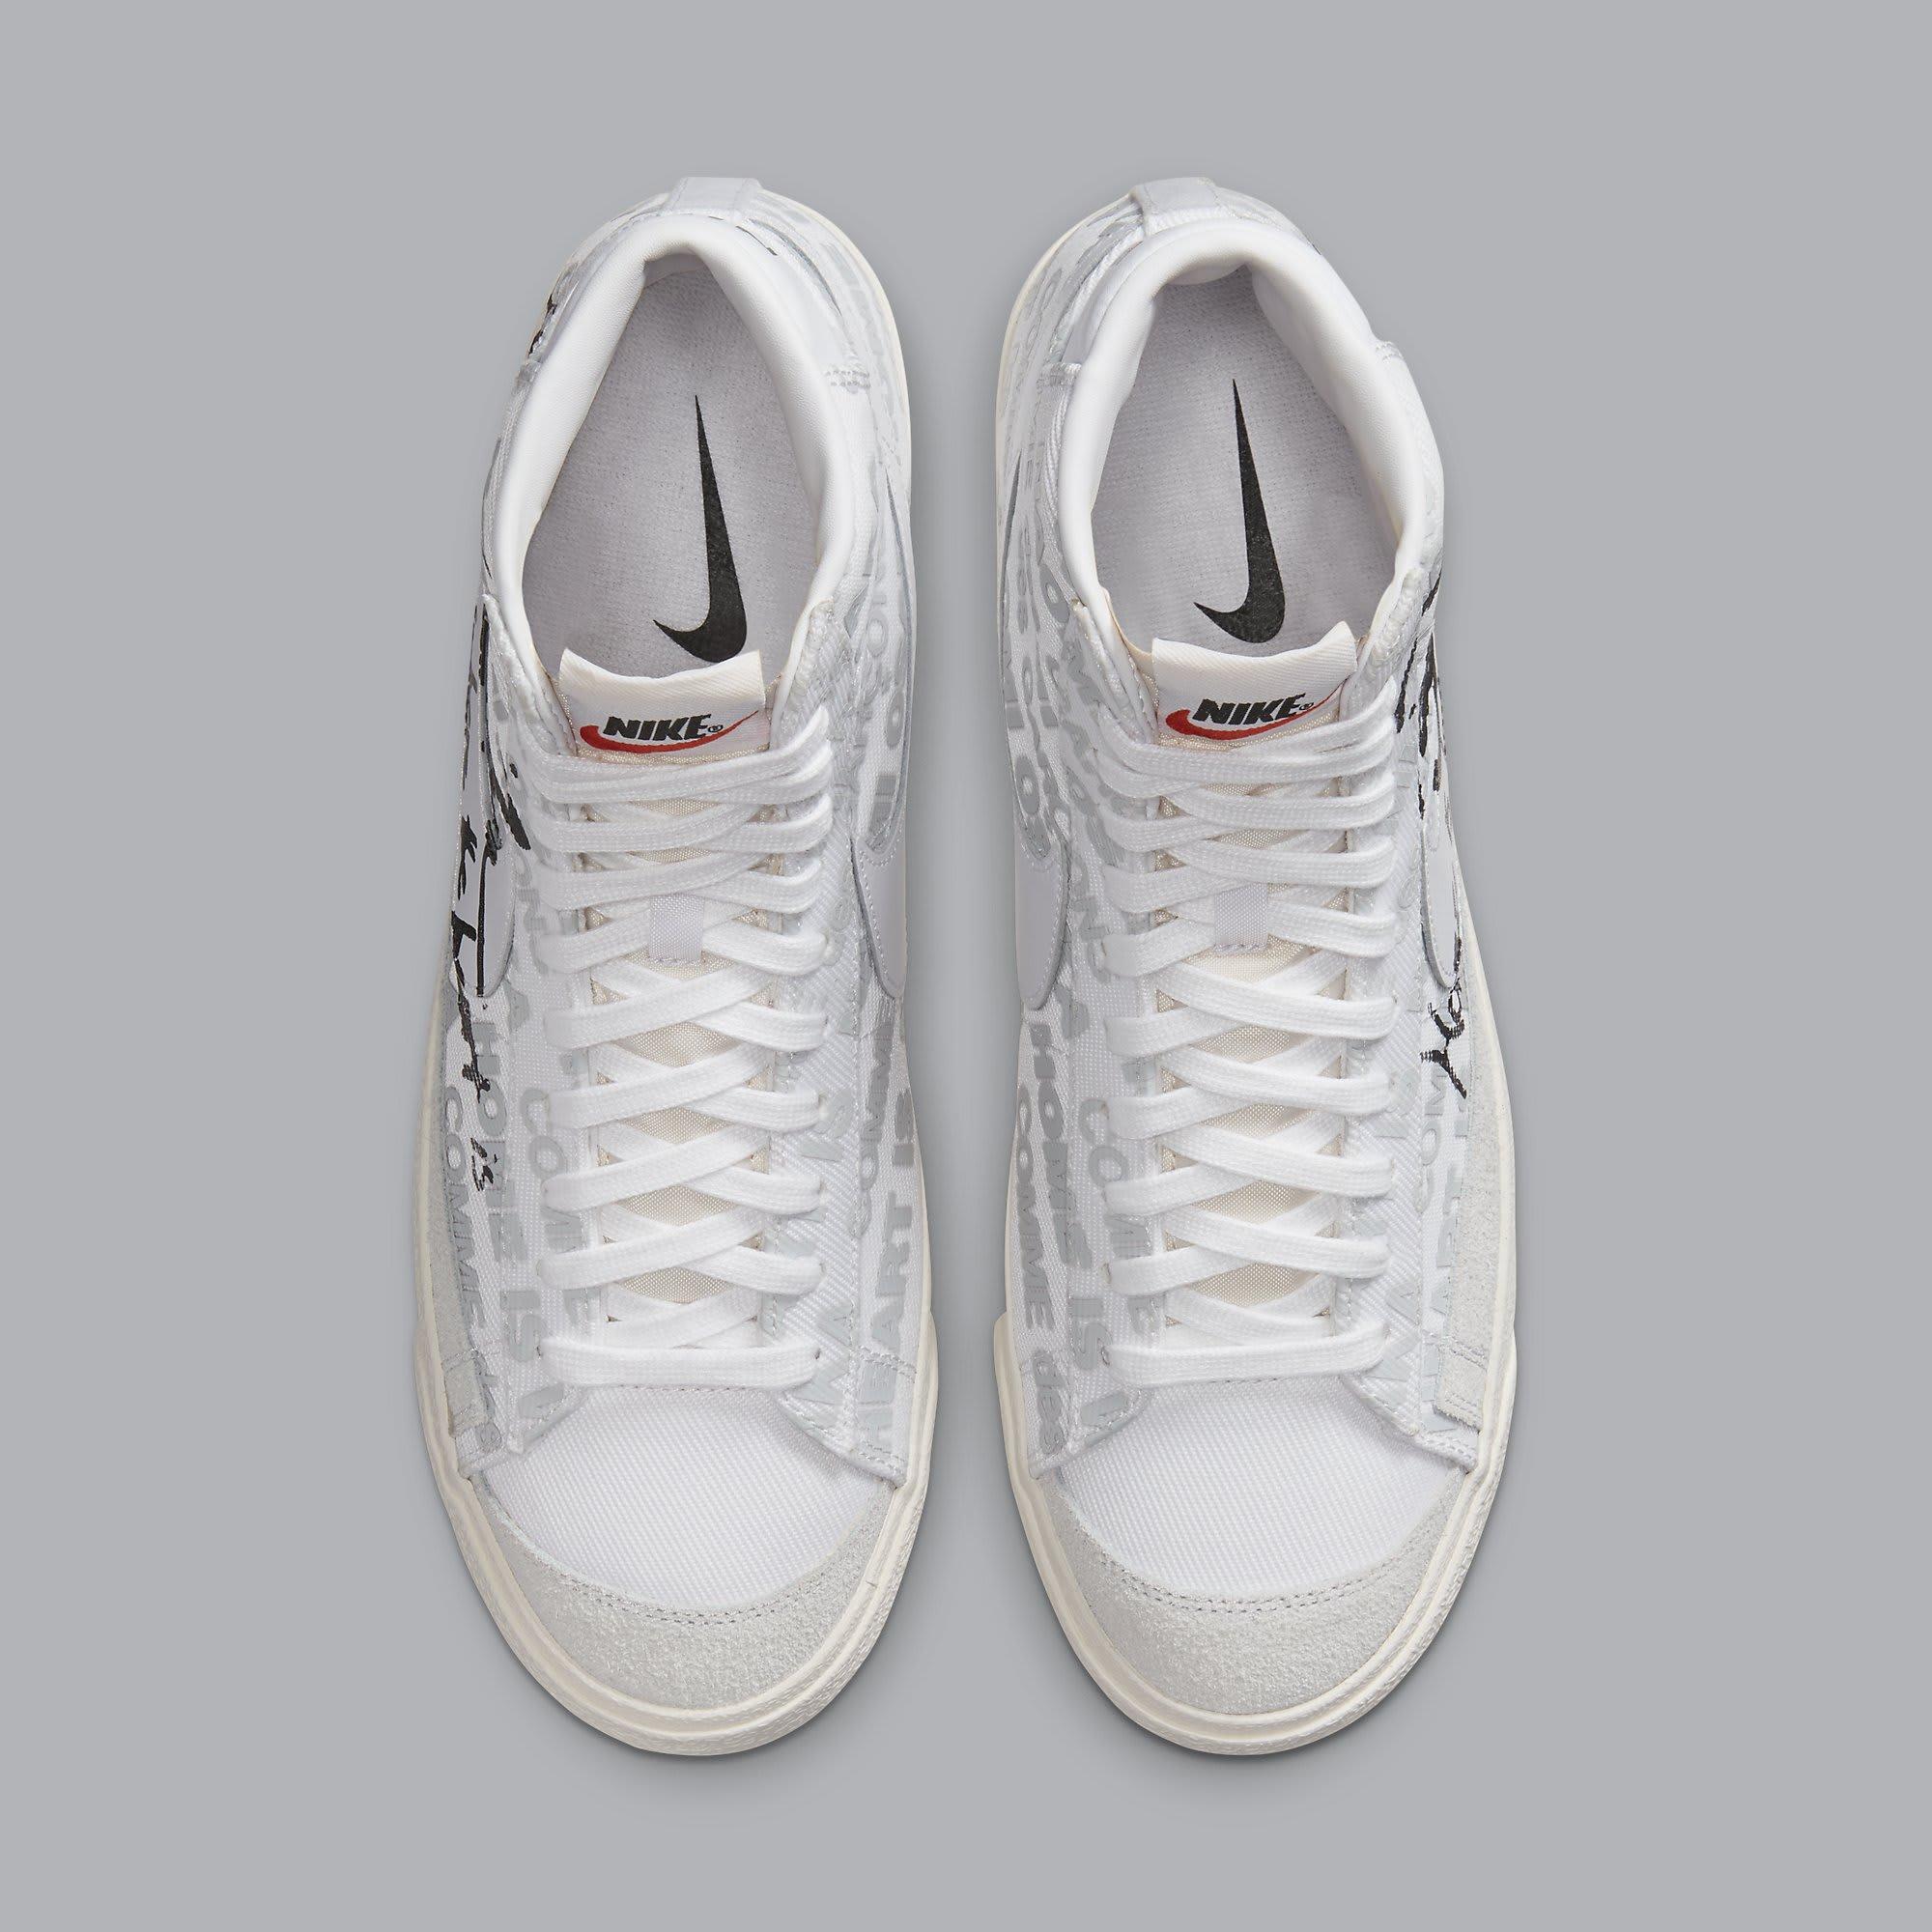 Comme des Garcons x Naomi Osaka x Nike Blazer Mid DA5383-100 Top